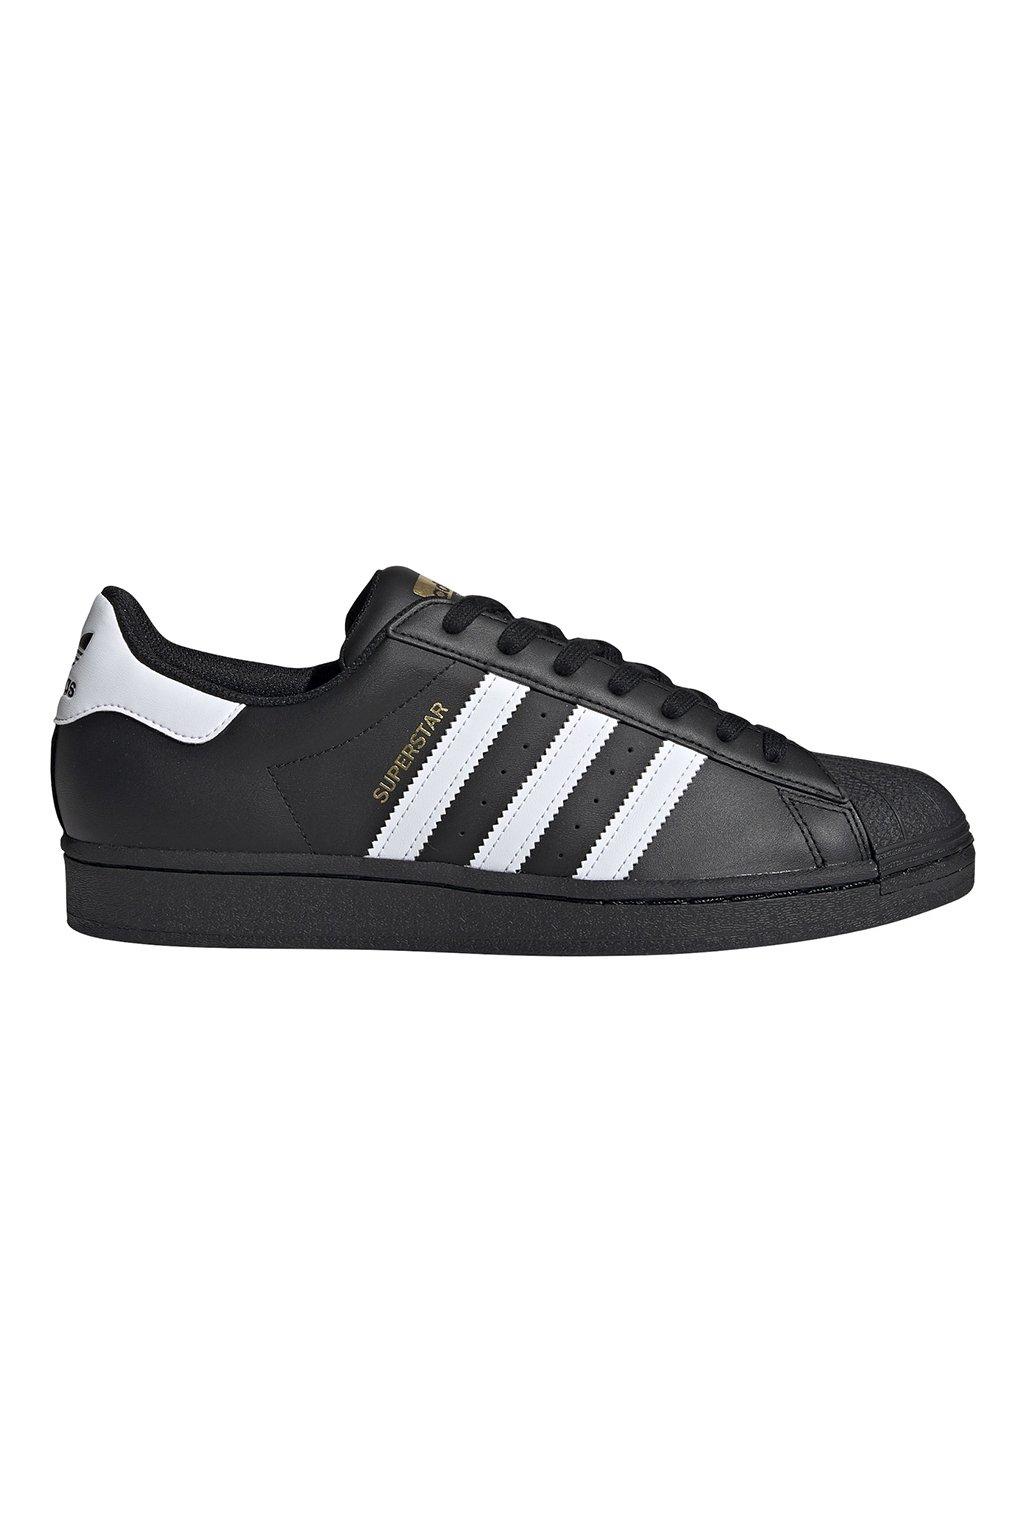 Pánska obuv Adidas Superstar čierno biele EG4959